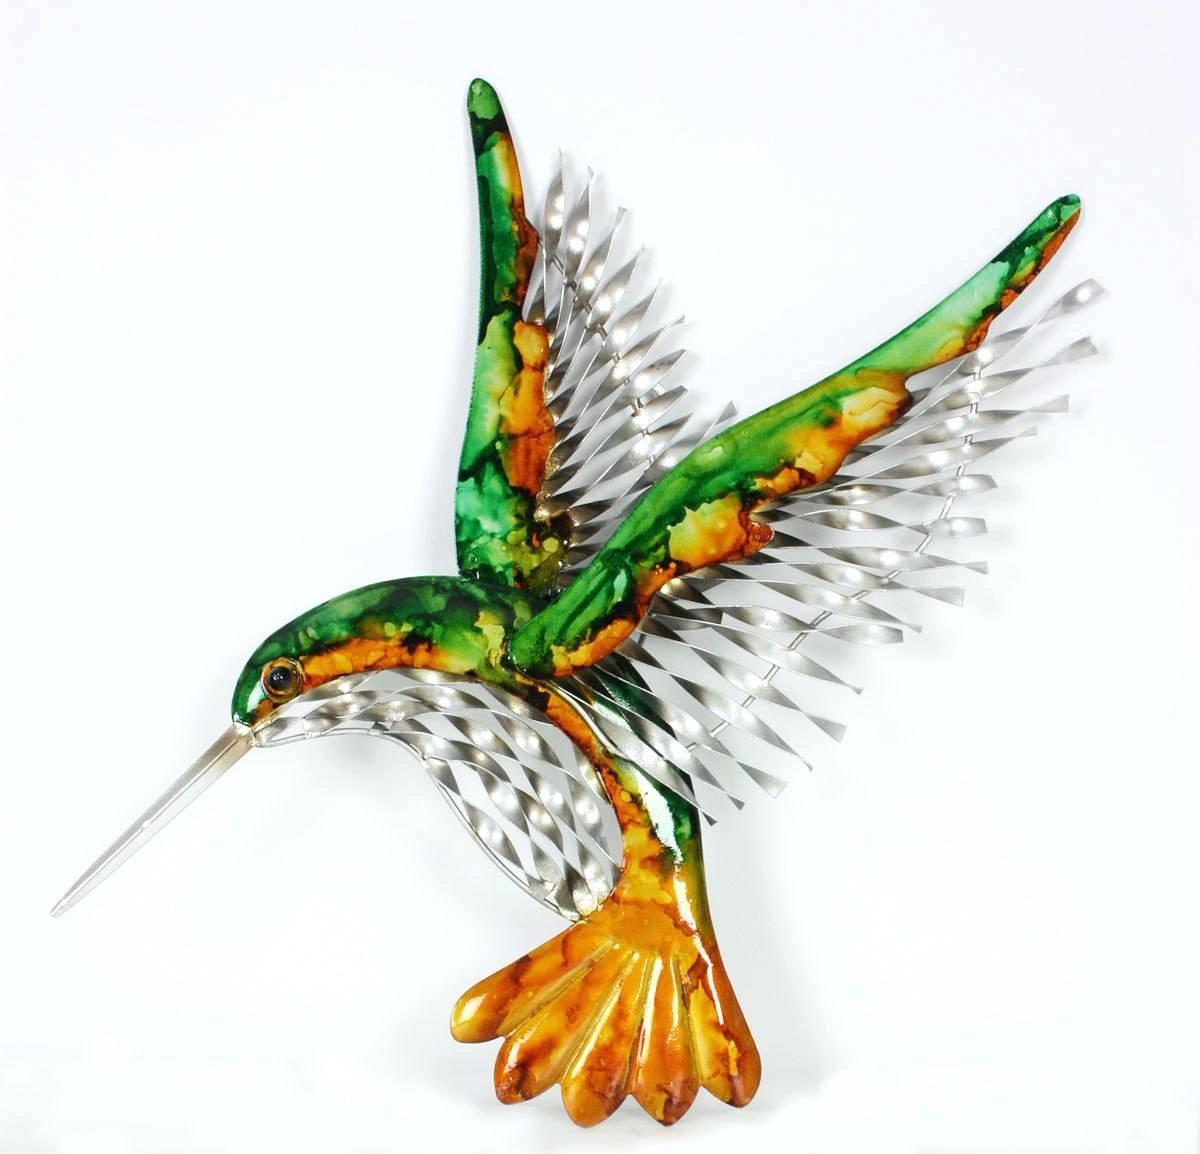 Wall Arts ~ Hummingbird Wall Art Next Hummingbird Nectar Metal For Best And Newest Hummingbird Metal Wall Art (View 2 of 20)